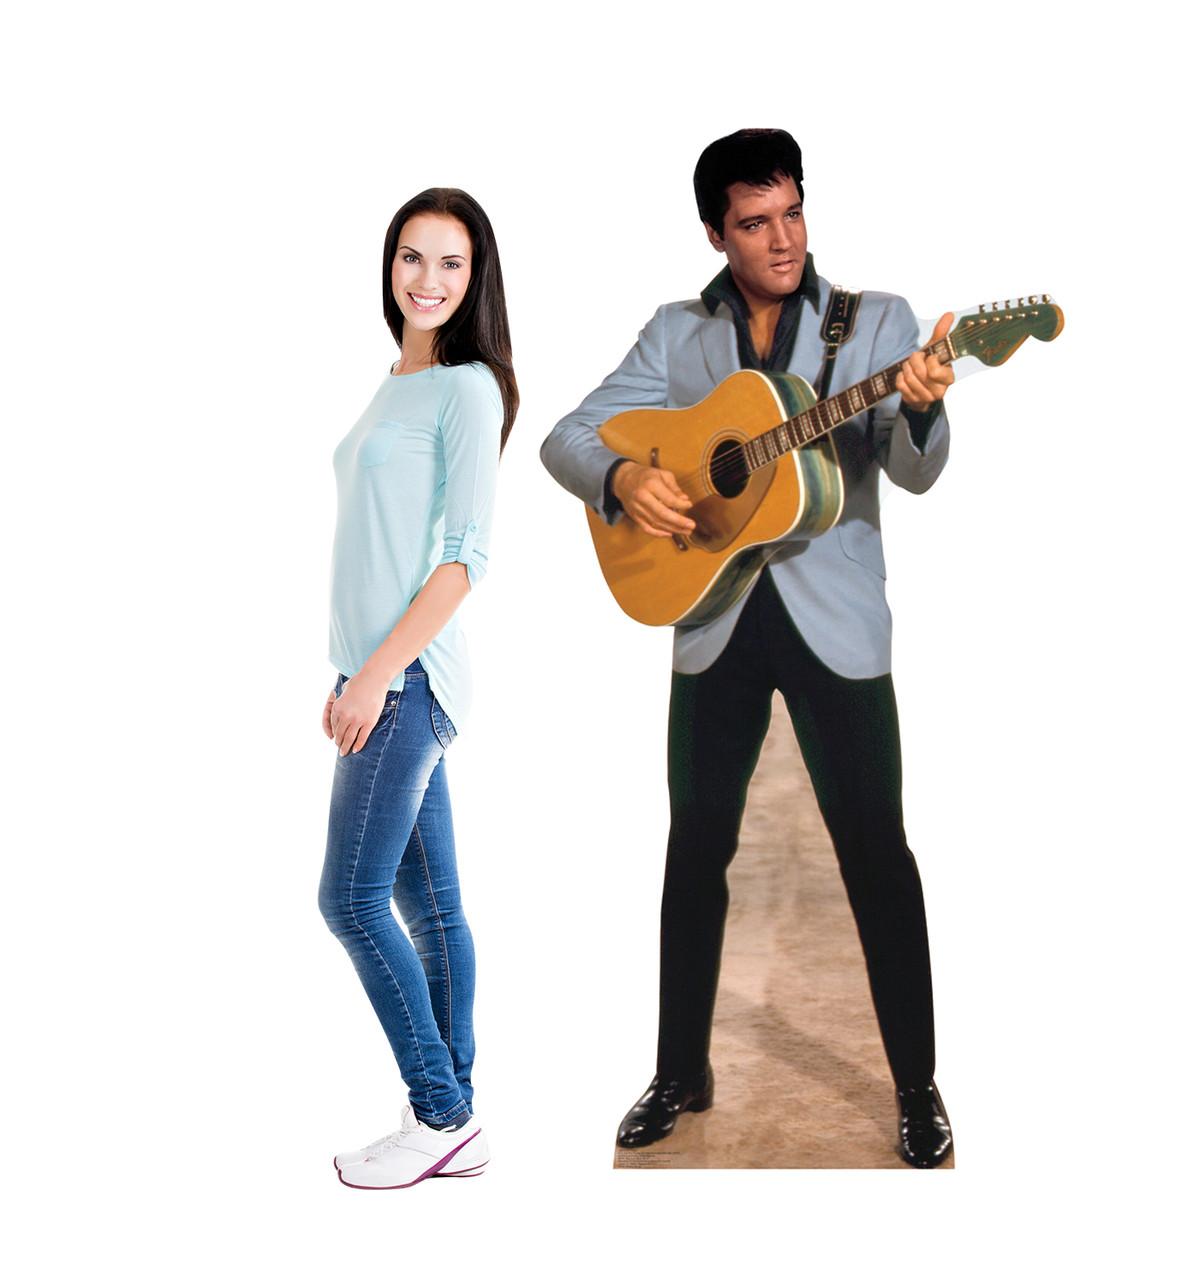 Elvis Light Blue Jacket - Cardboard Cutout 1352